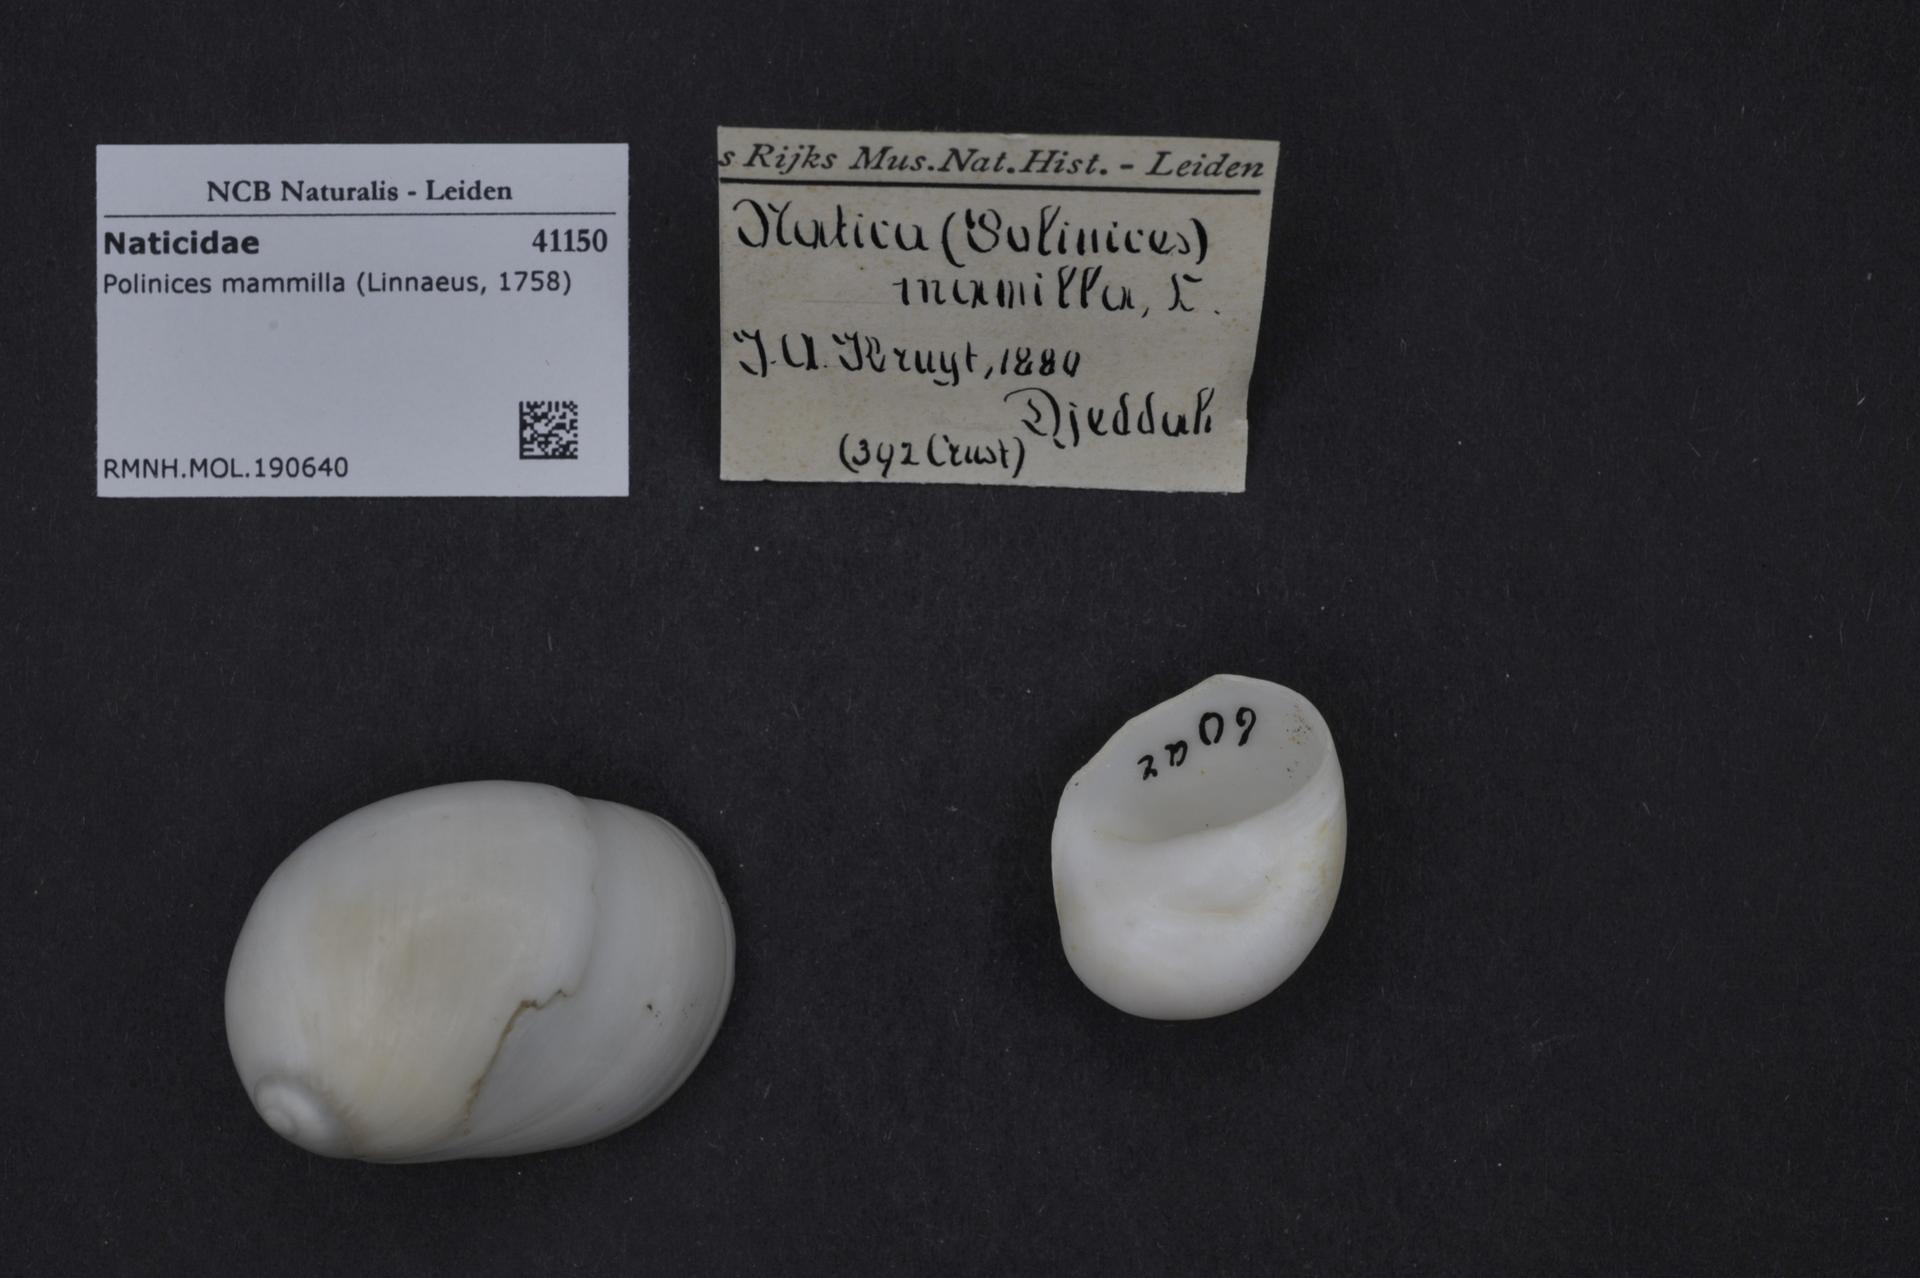 RMNH.MOL.190640 | Polinices mammilla (Linnaeus, 1758)